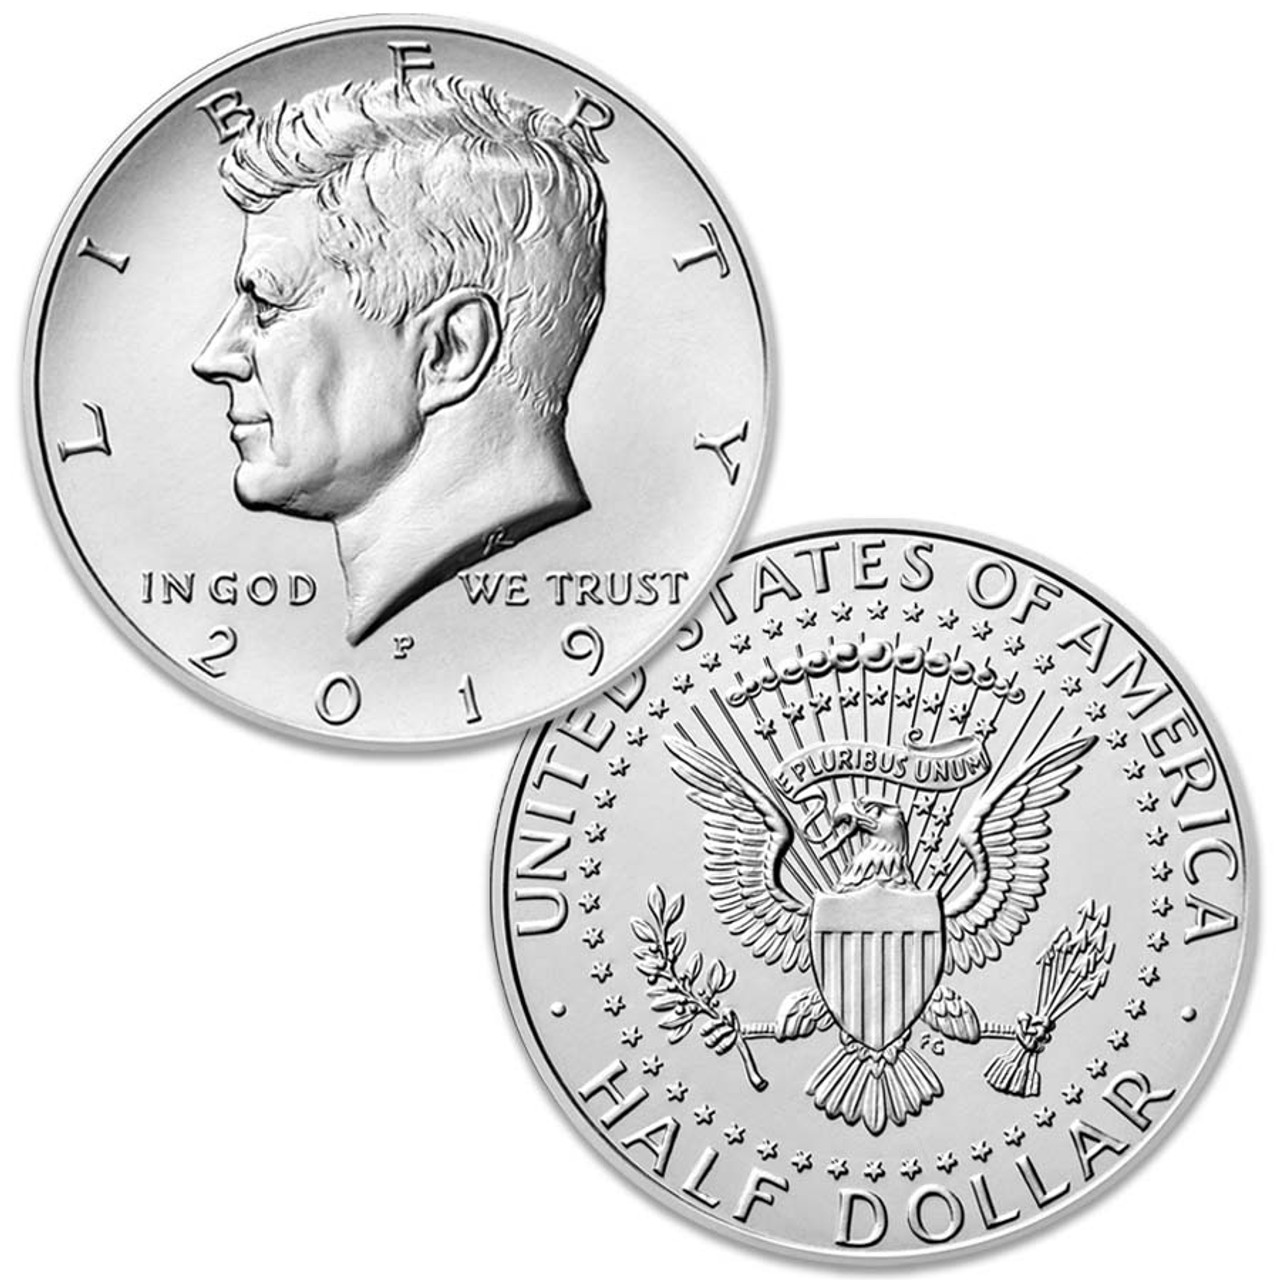 2019-P Kennedy Half Dollar Brilliant Uncirculated Image 1